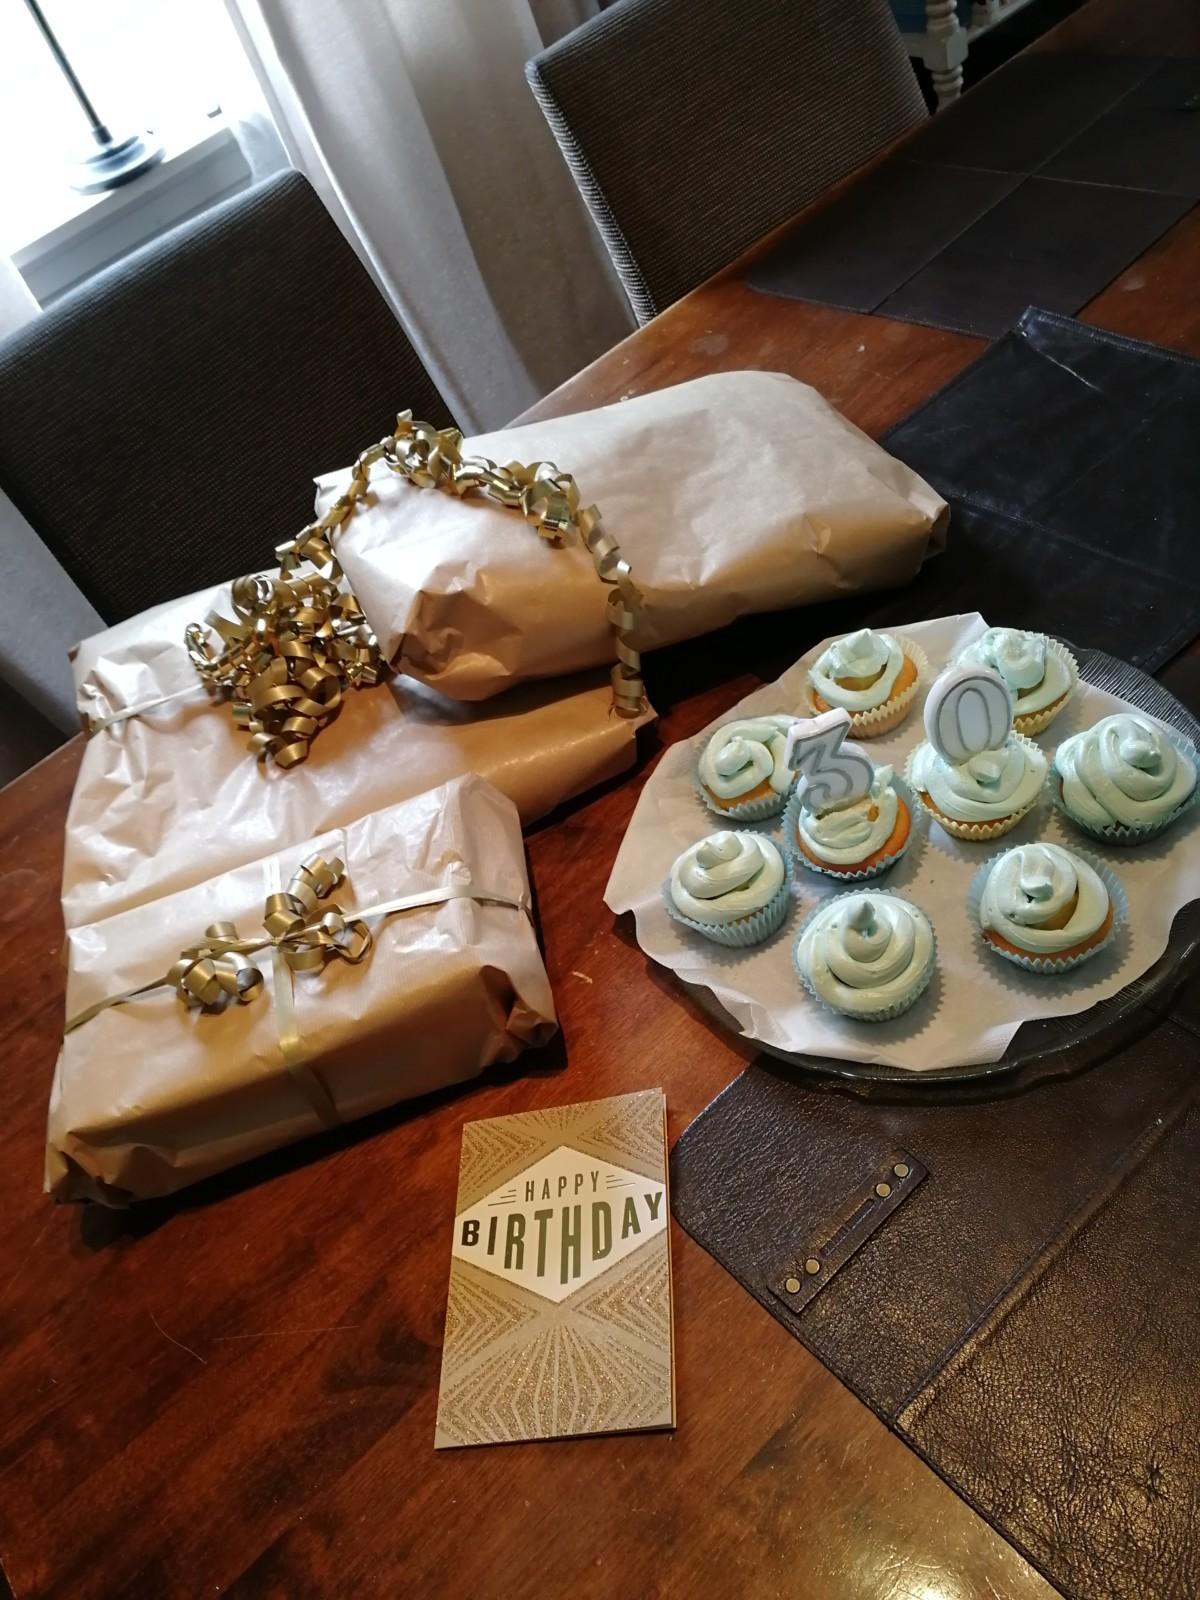 isalicious-blogg-bloggno-blogger-blogging-muffins-cupcakes-frosting-birthday-bursdag-30årsdag-corona-covid19-handsome-food-dessert-suprise-breakfast-overraskelse-kebab